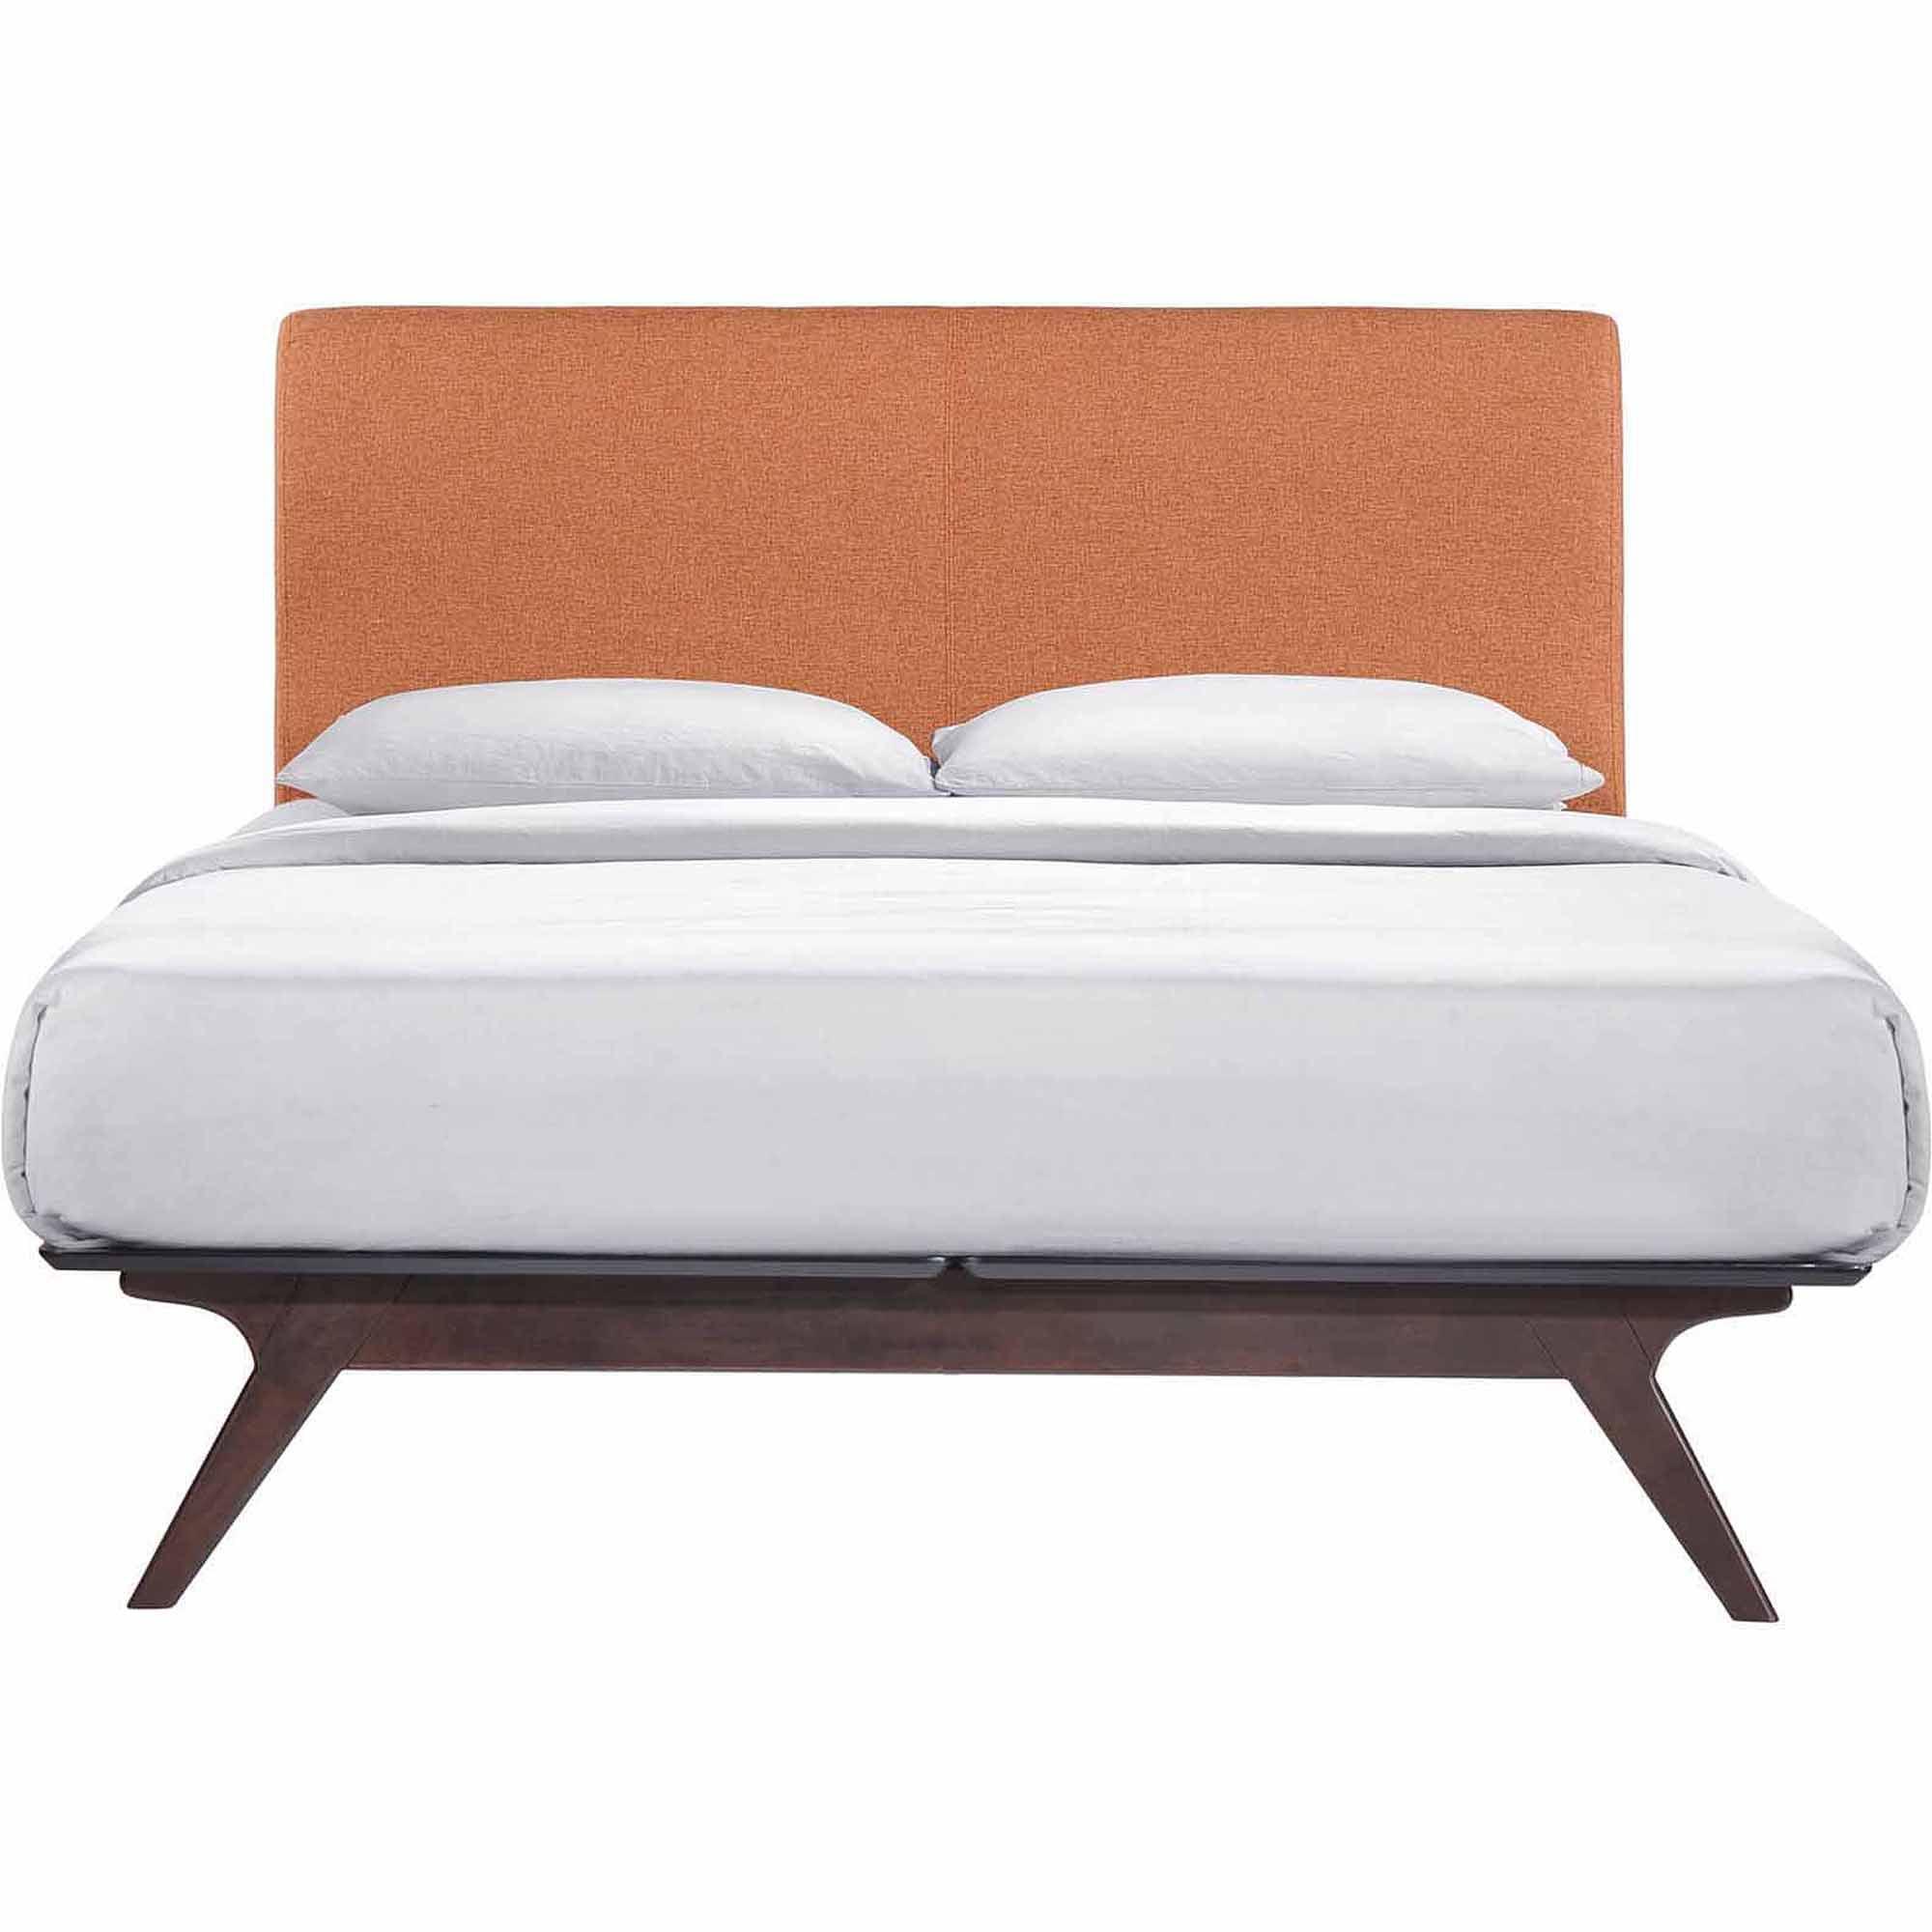 modway tracy queen upholstered platform bed multiple colors walmartcom - Queen Platform Bed Frames